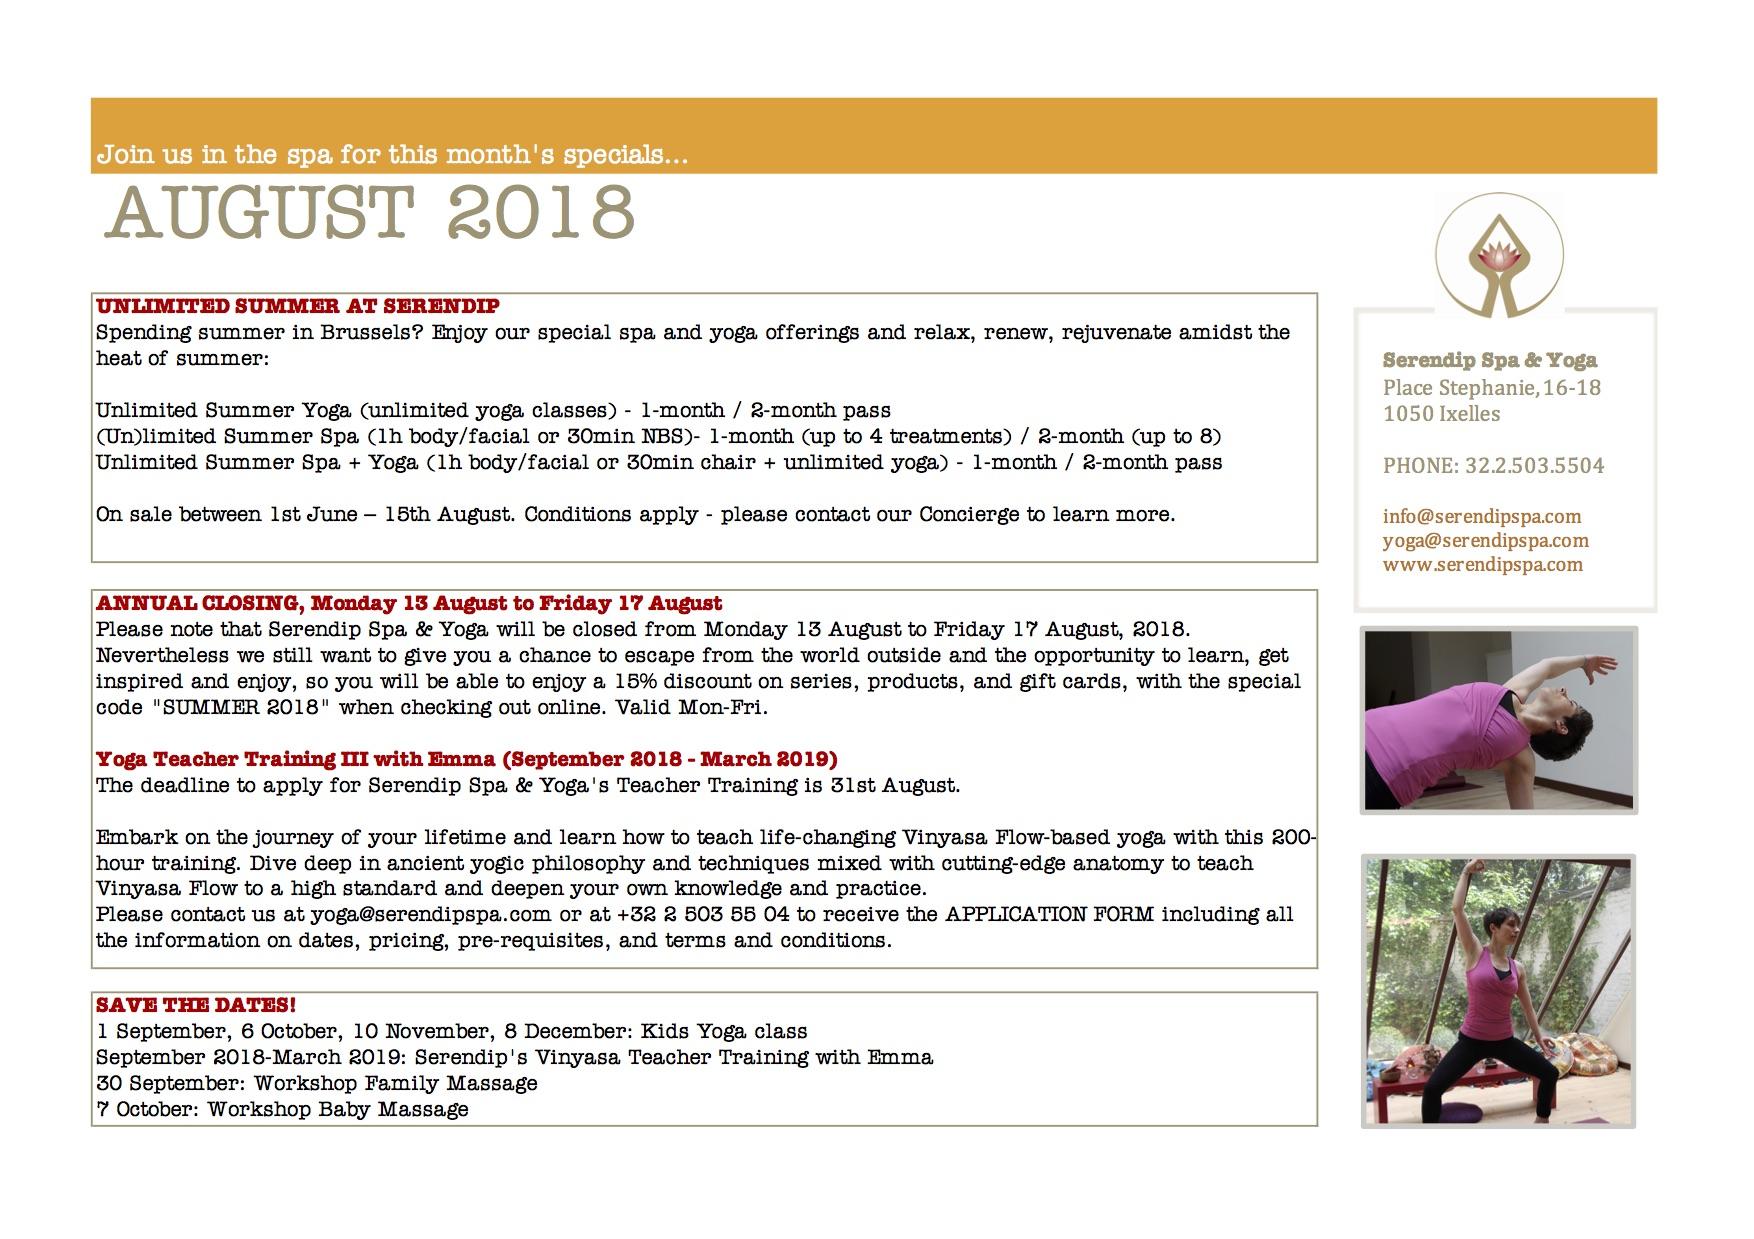 serendip spa and yoga calendar 2018_August A4 BACK.jpg